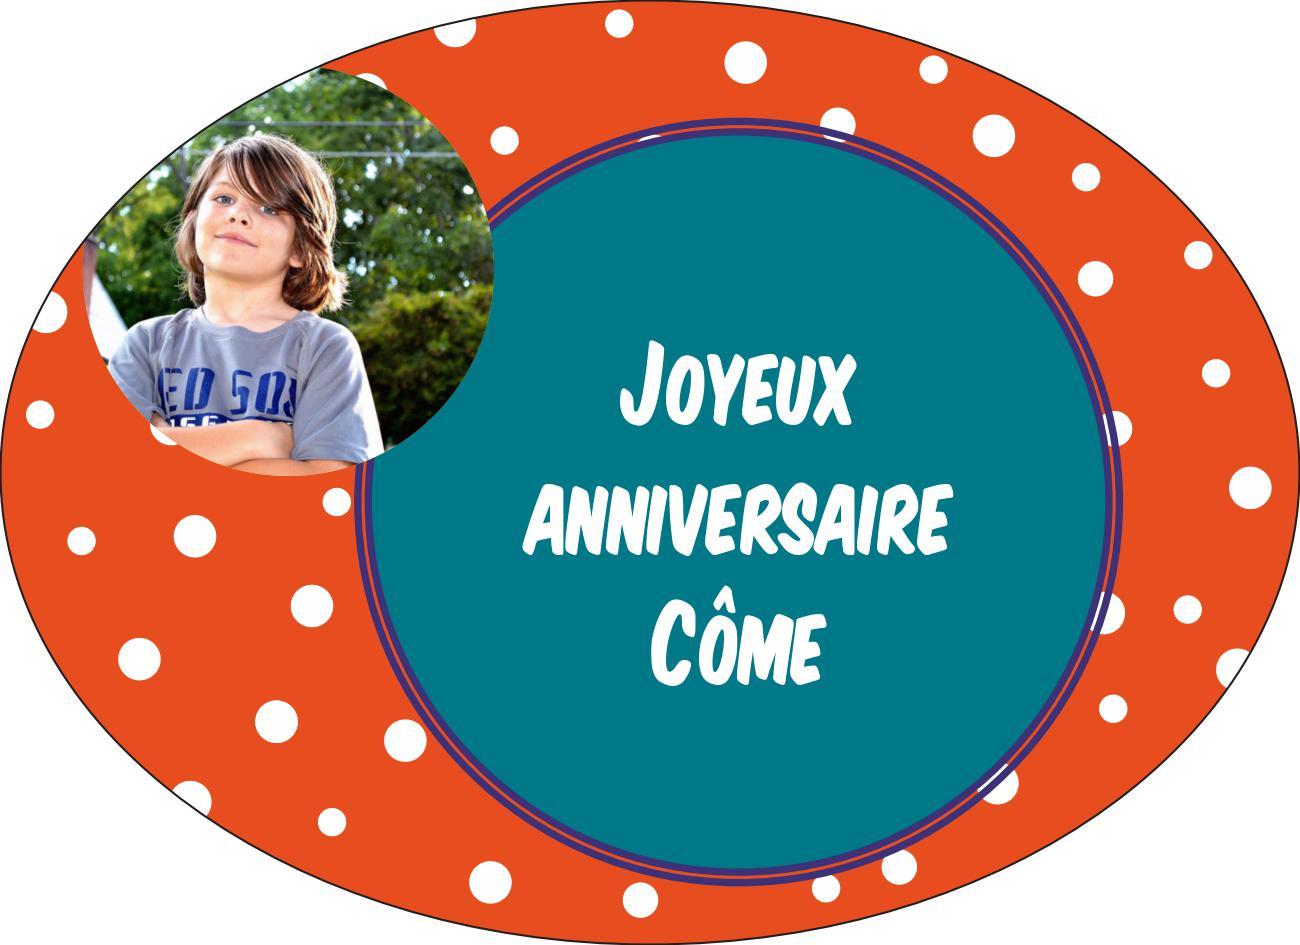 birthday-children-come_has-image